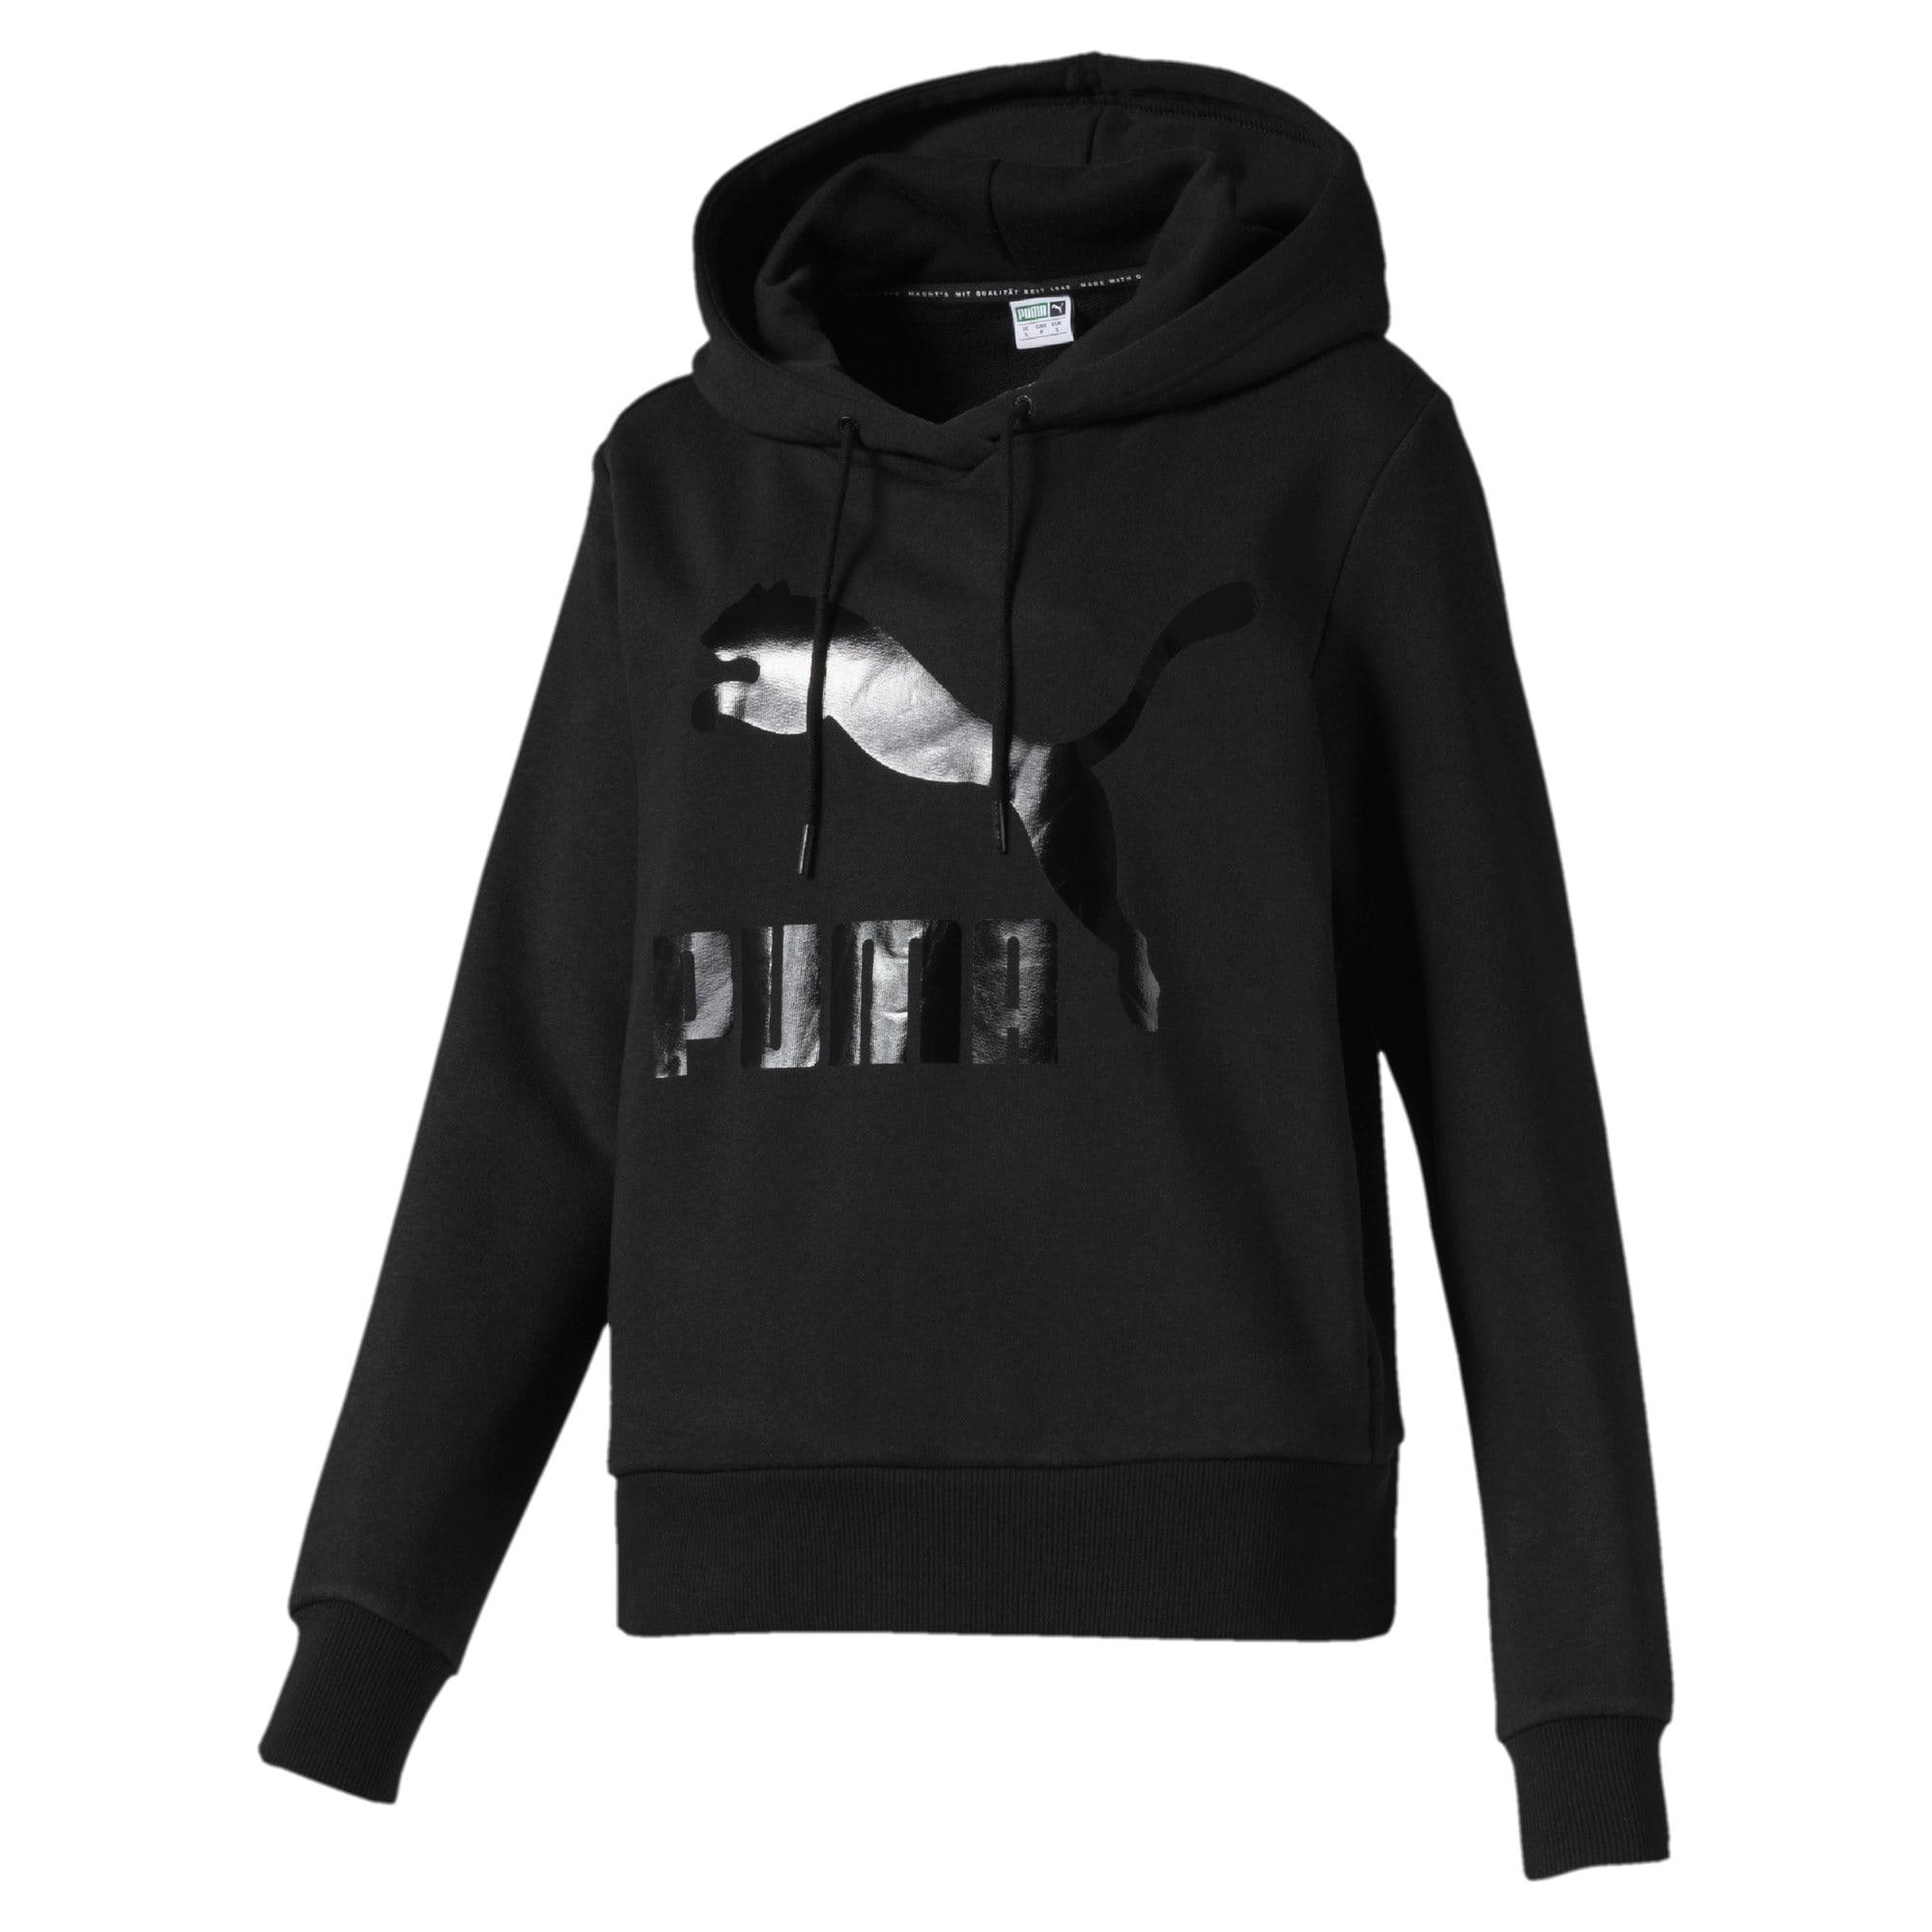 Thumbnail 1 of Classics Logo hoodie voor dames, Puma Black, medium